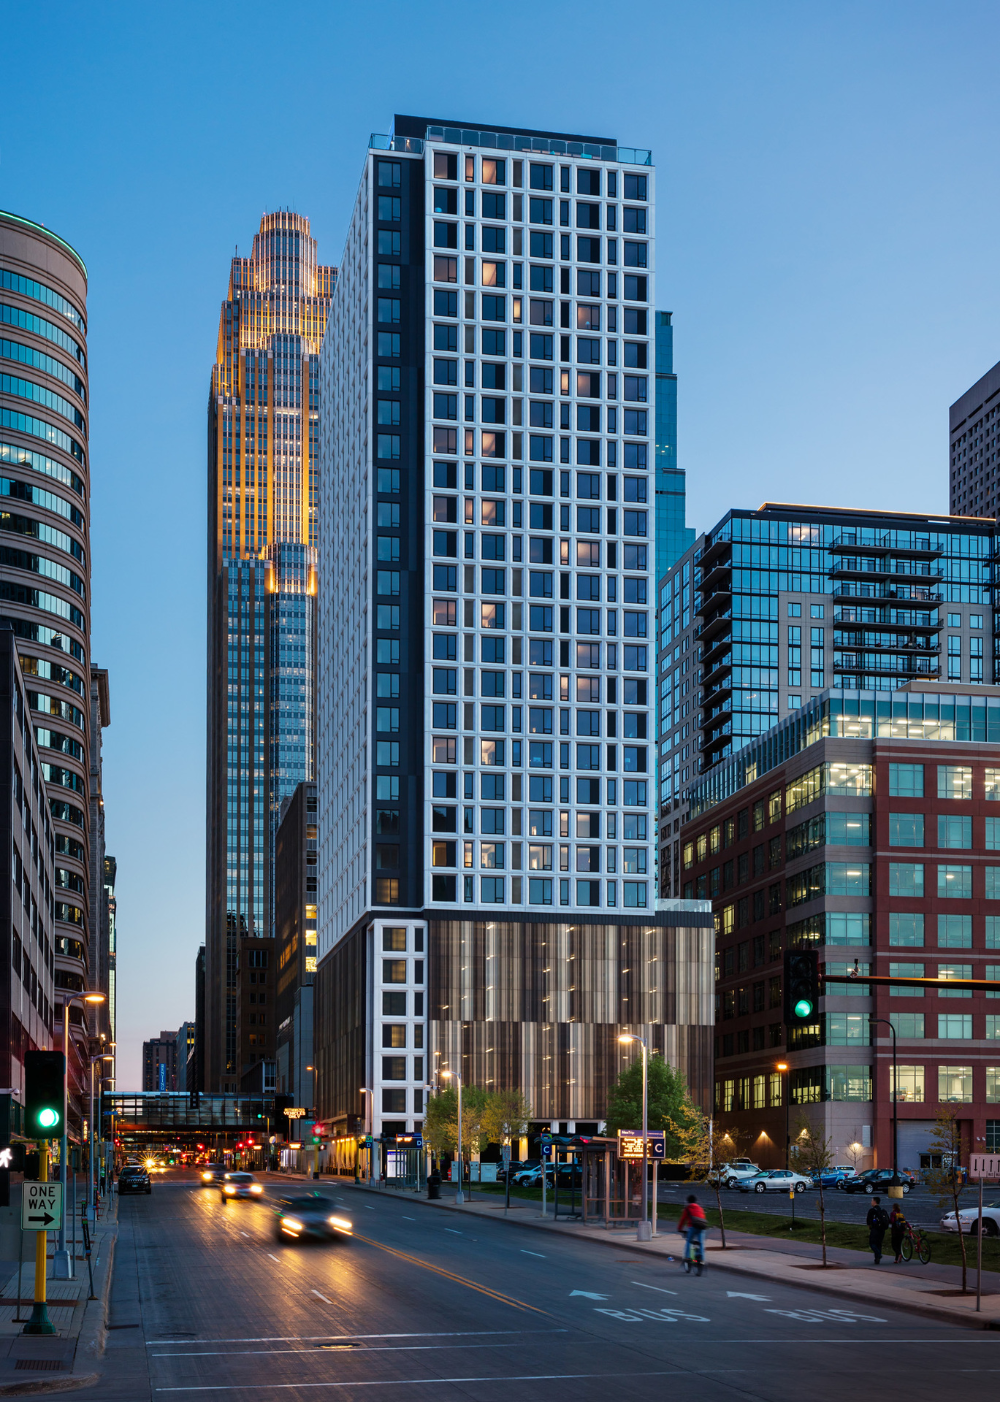 4marq Apartments Minneapolis Mn Urbanworks Architecture Apartments Exterior Apartment Architecture Architecture